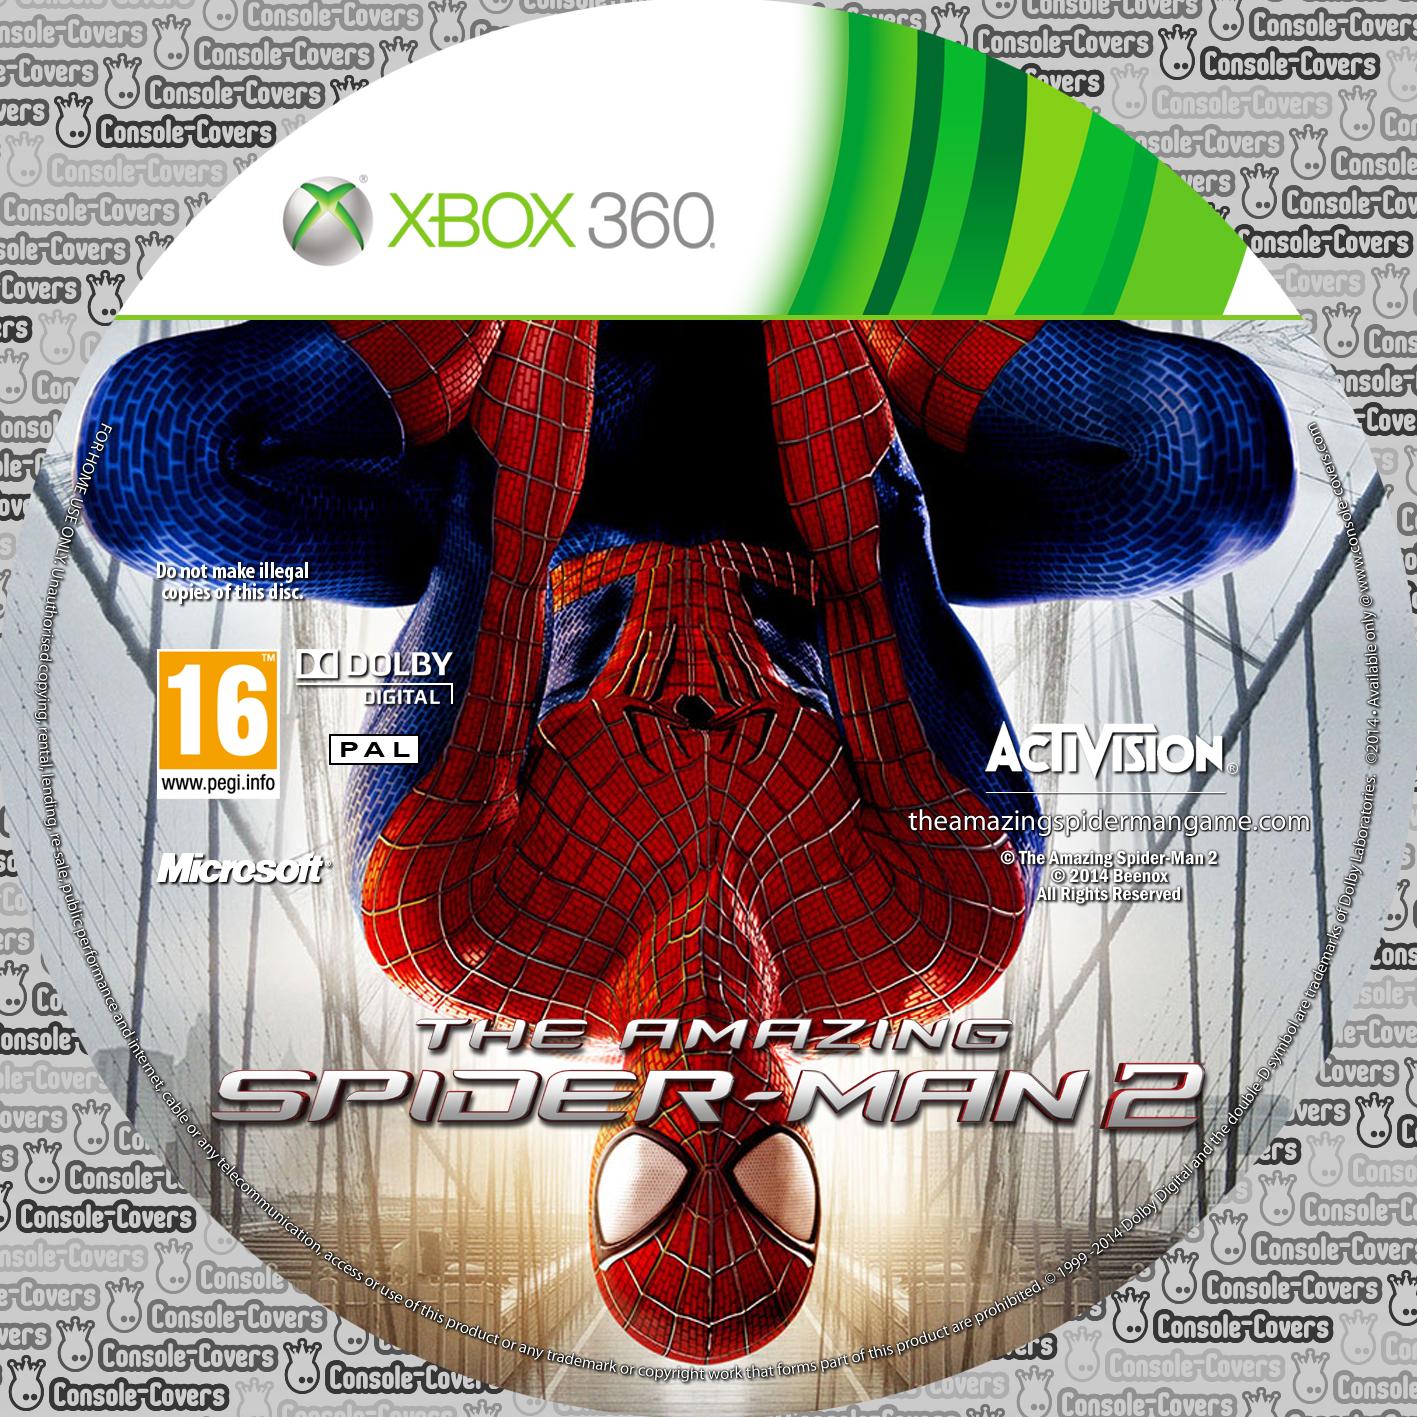 Amazing Spider-Man 2 CD.jpg